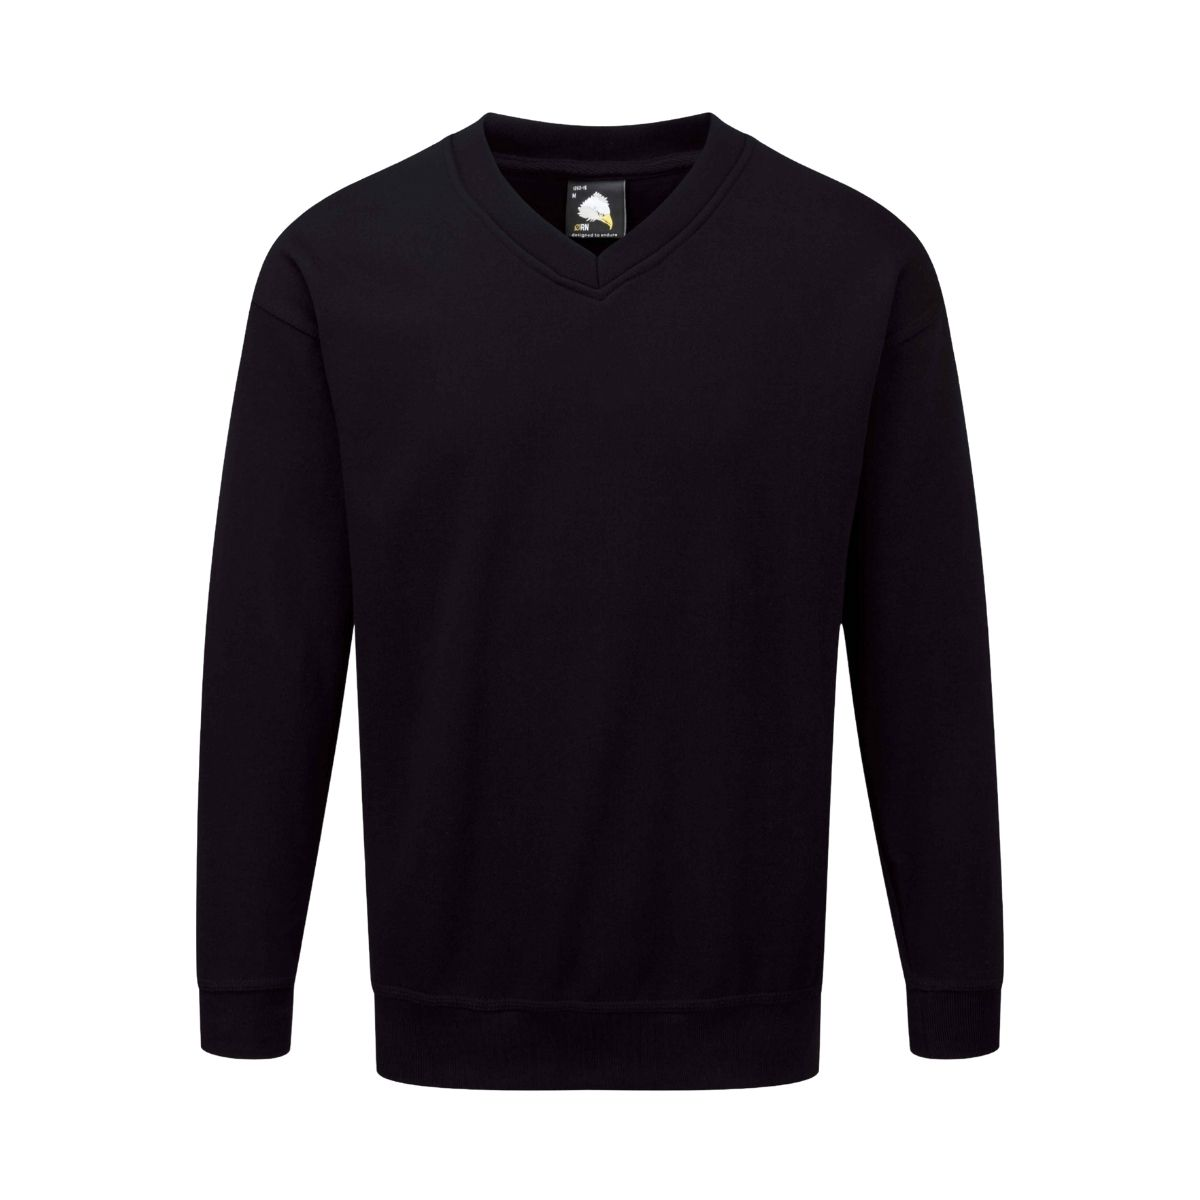 WW1261 100% Cotton V Neck Sweatshirt